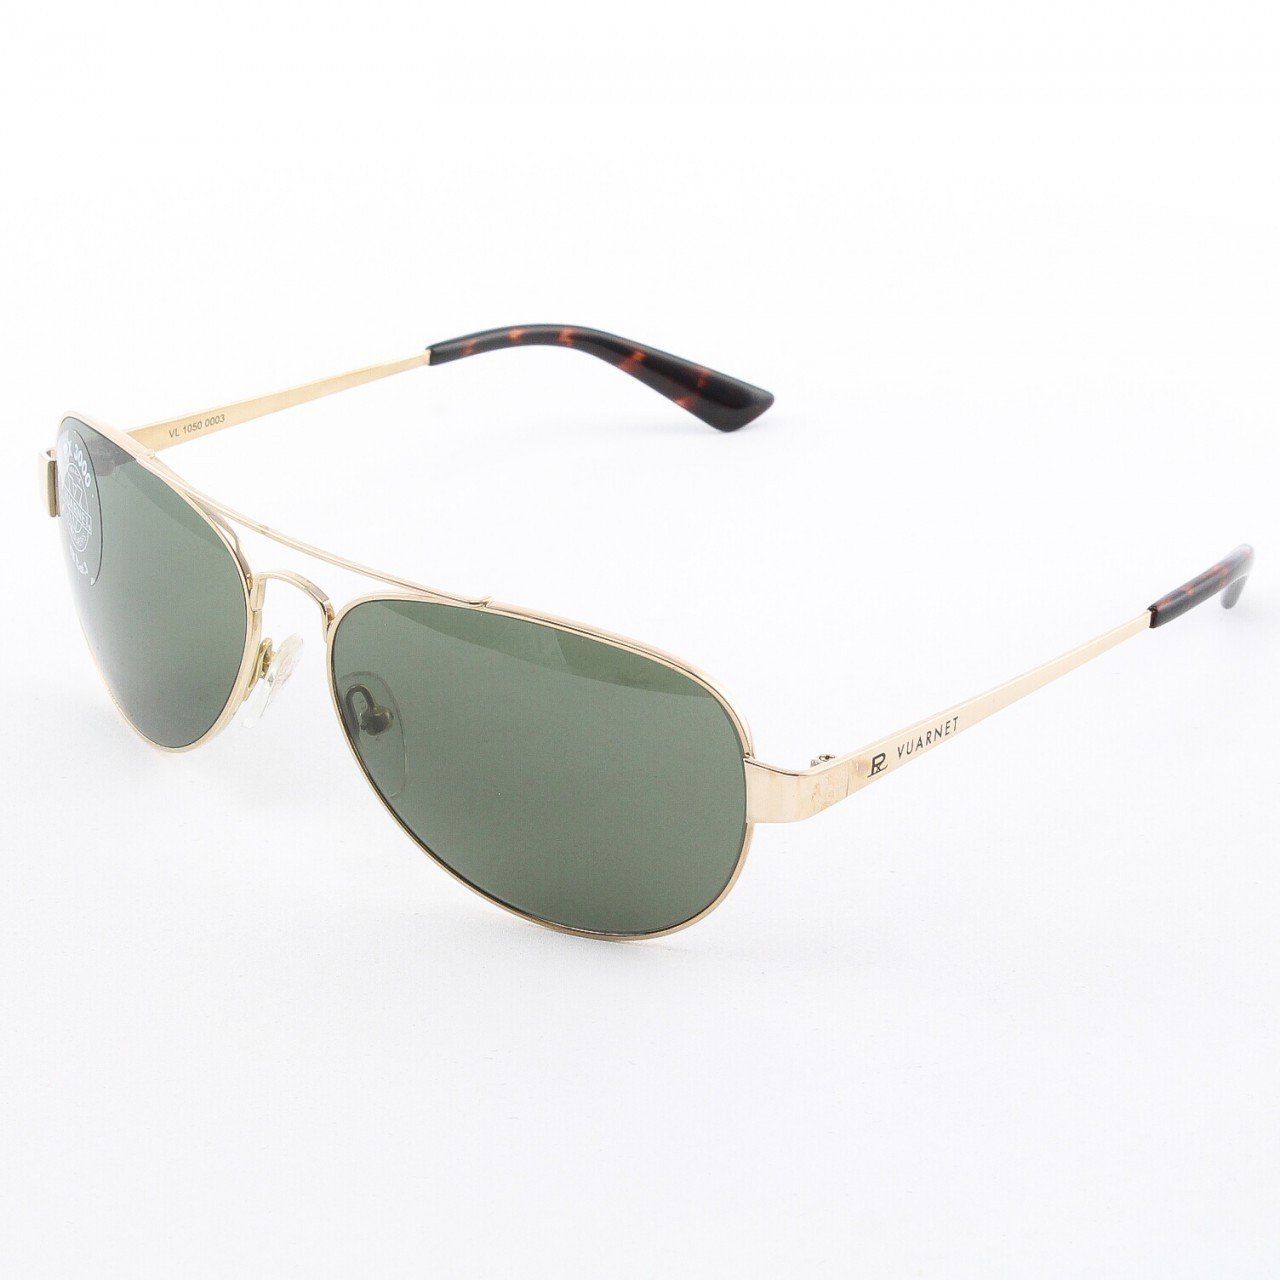 Vuarnet VL 1050 Aviator Sunglasses Col. Gold with Green PX3000 Lenses